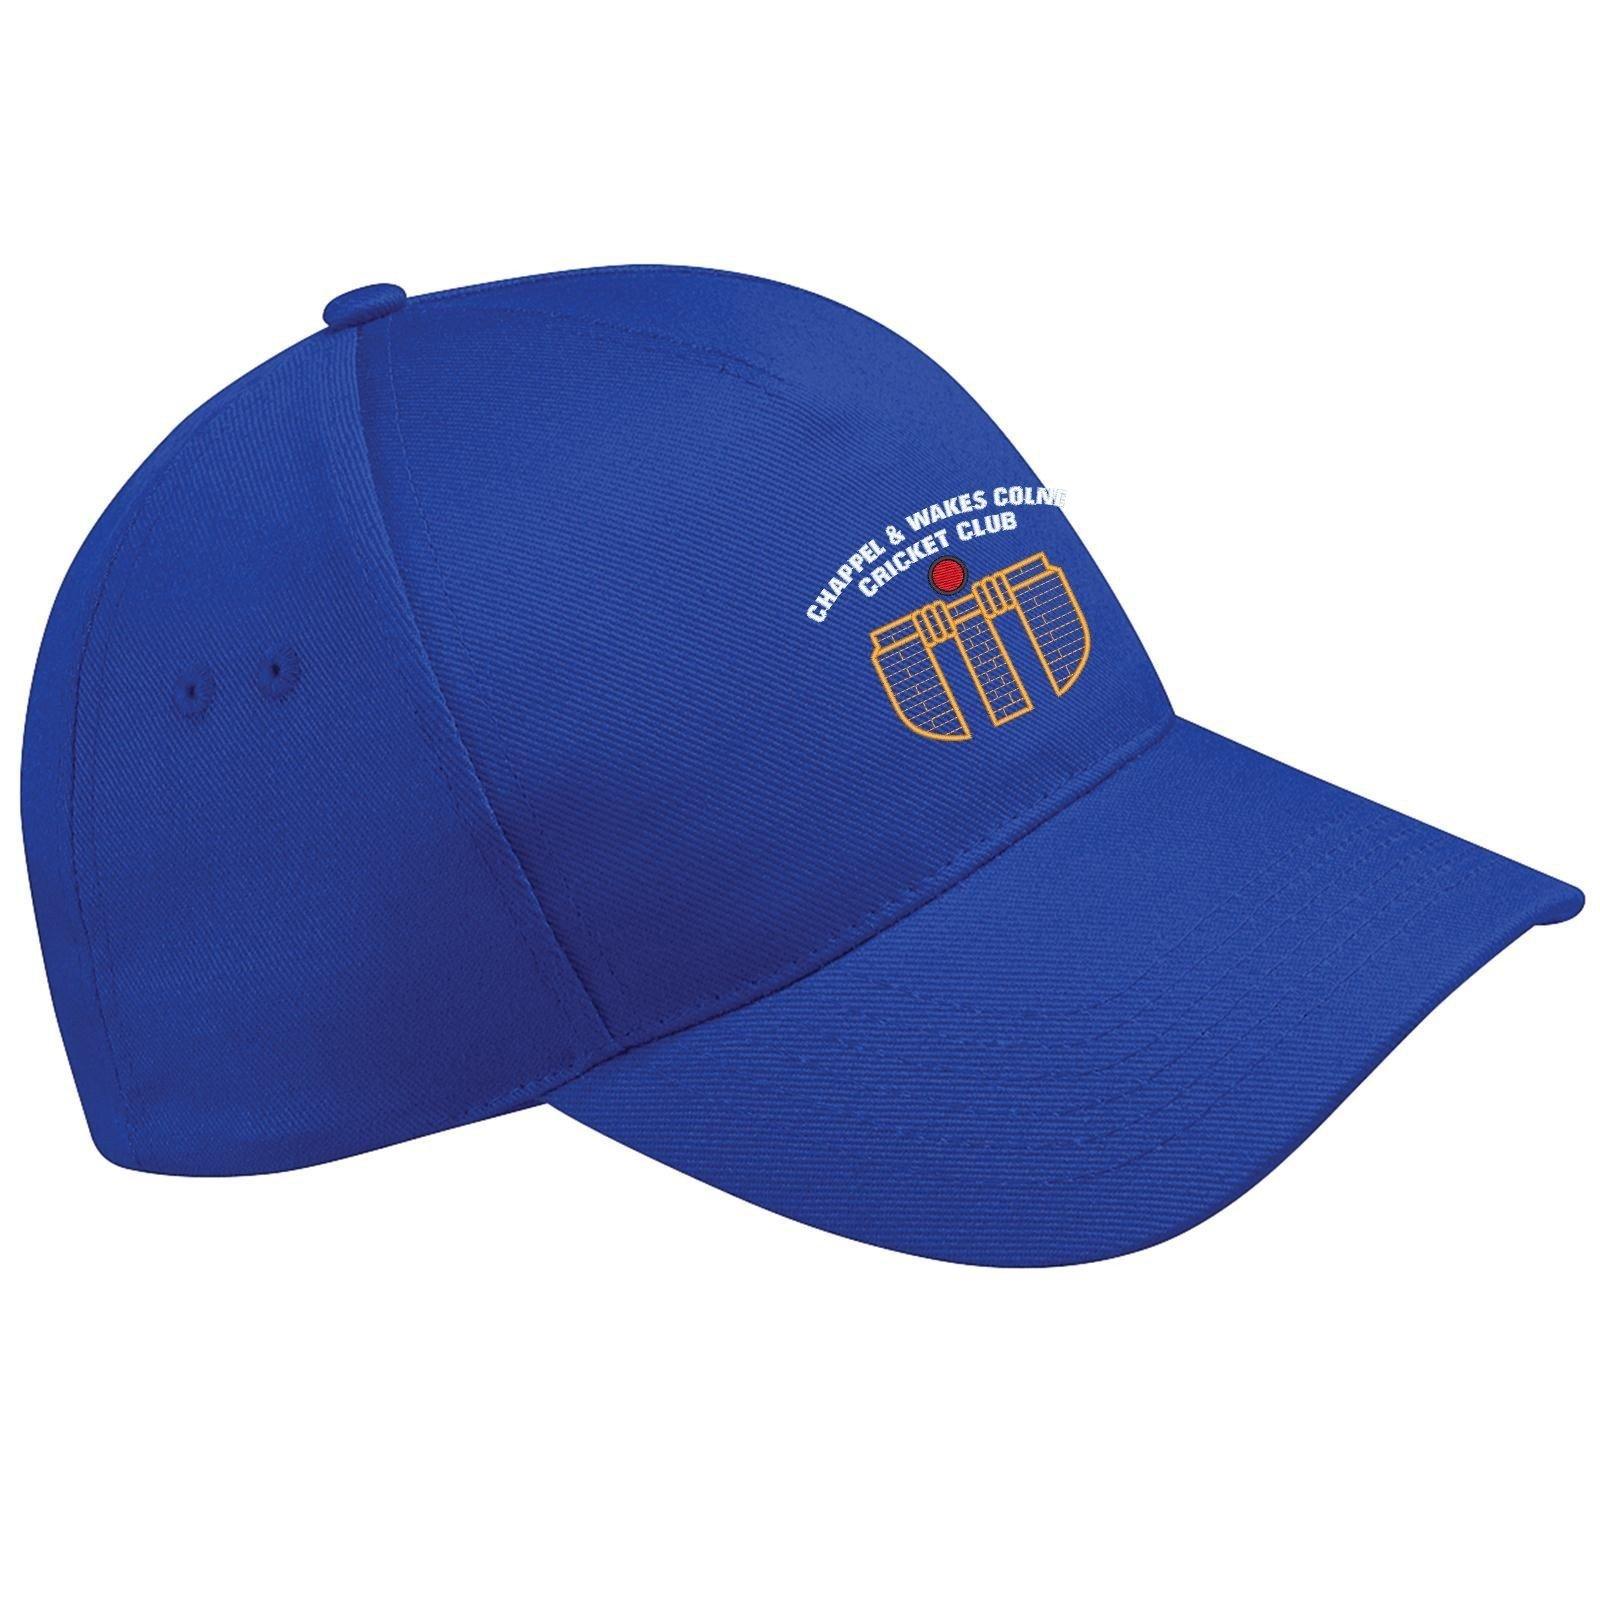 Chappel & Wakes Colne CC Royal Blue Baseball Cap